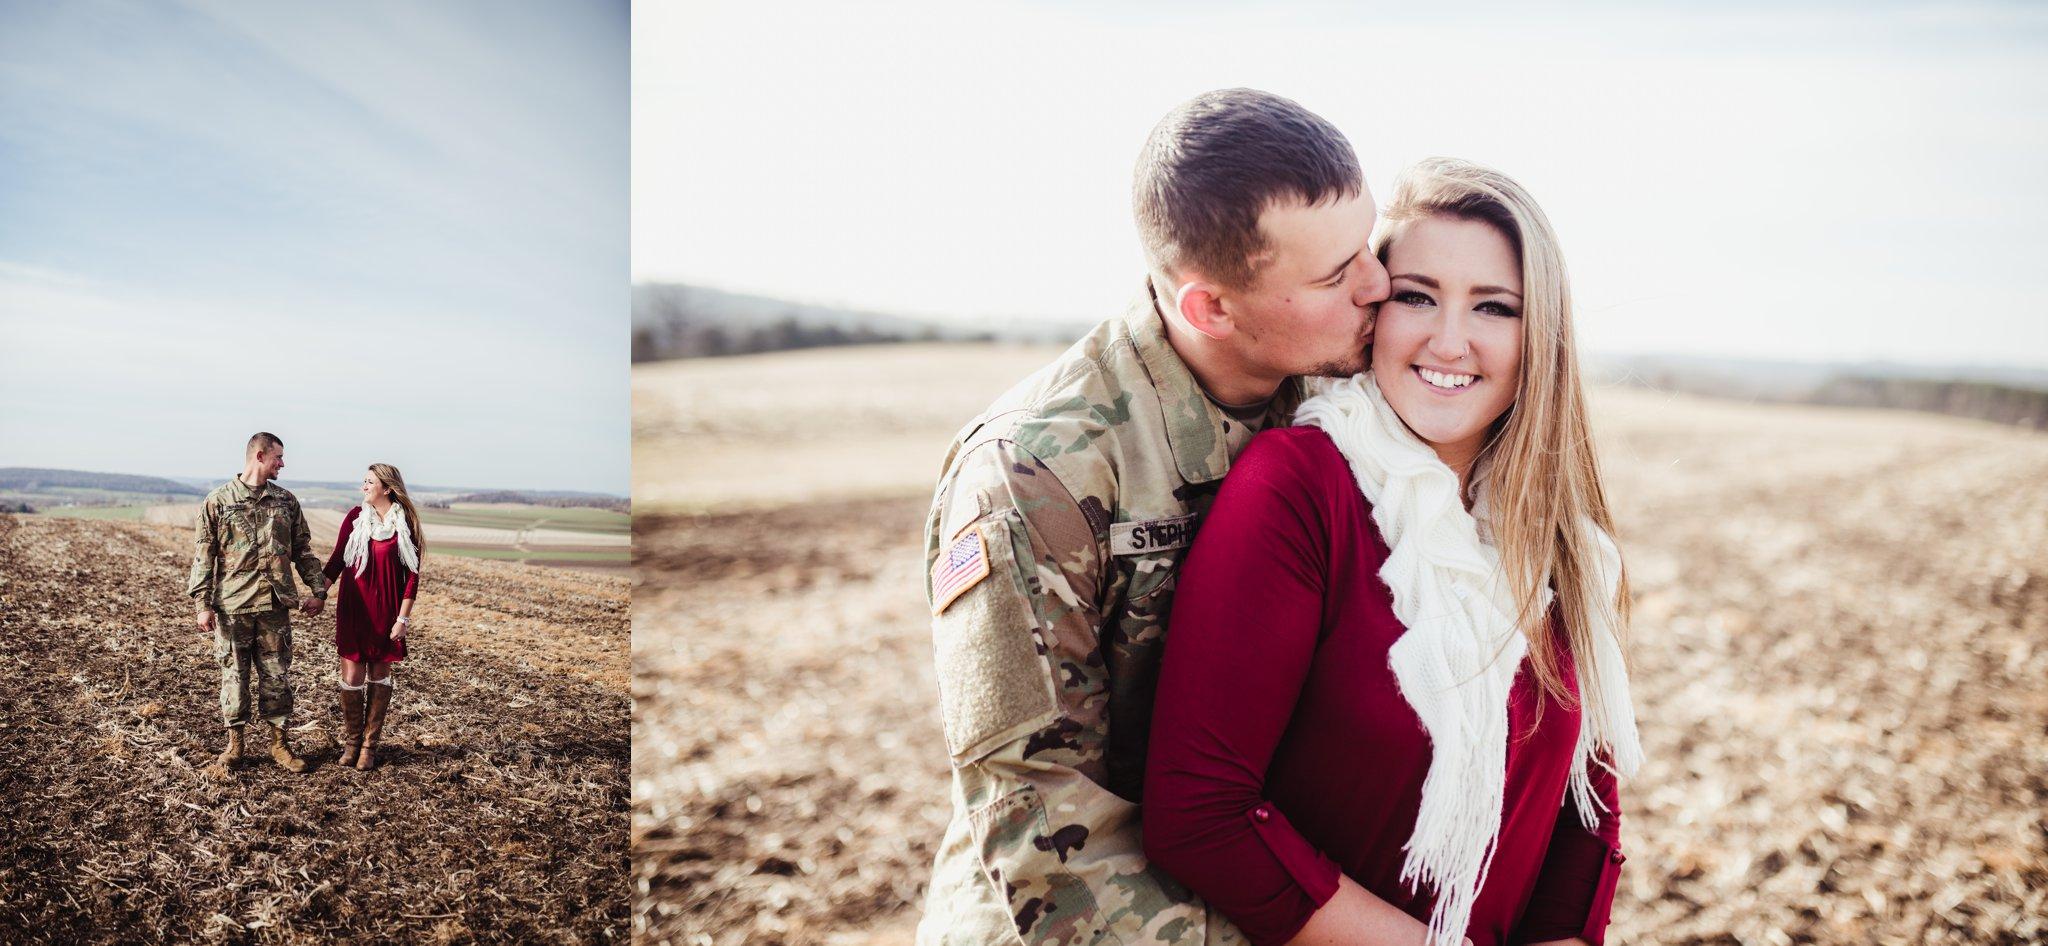 engagement photo kiss on cheek.jpg